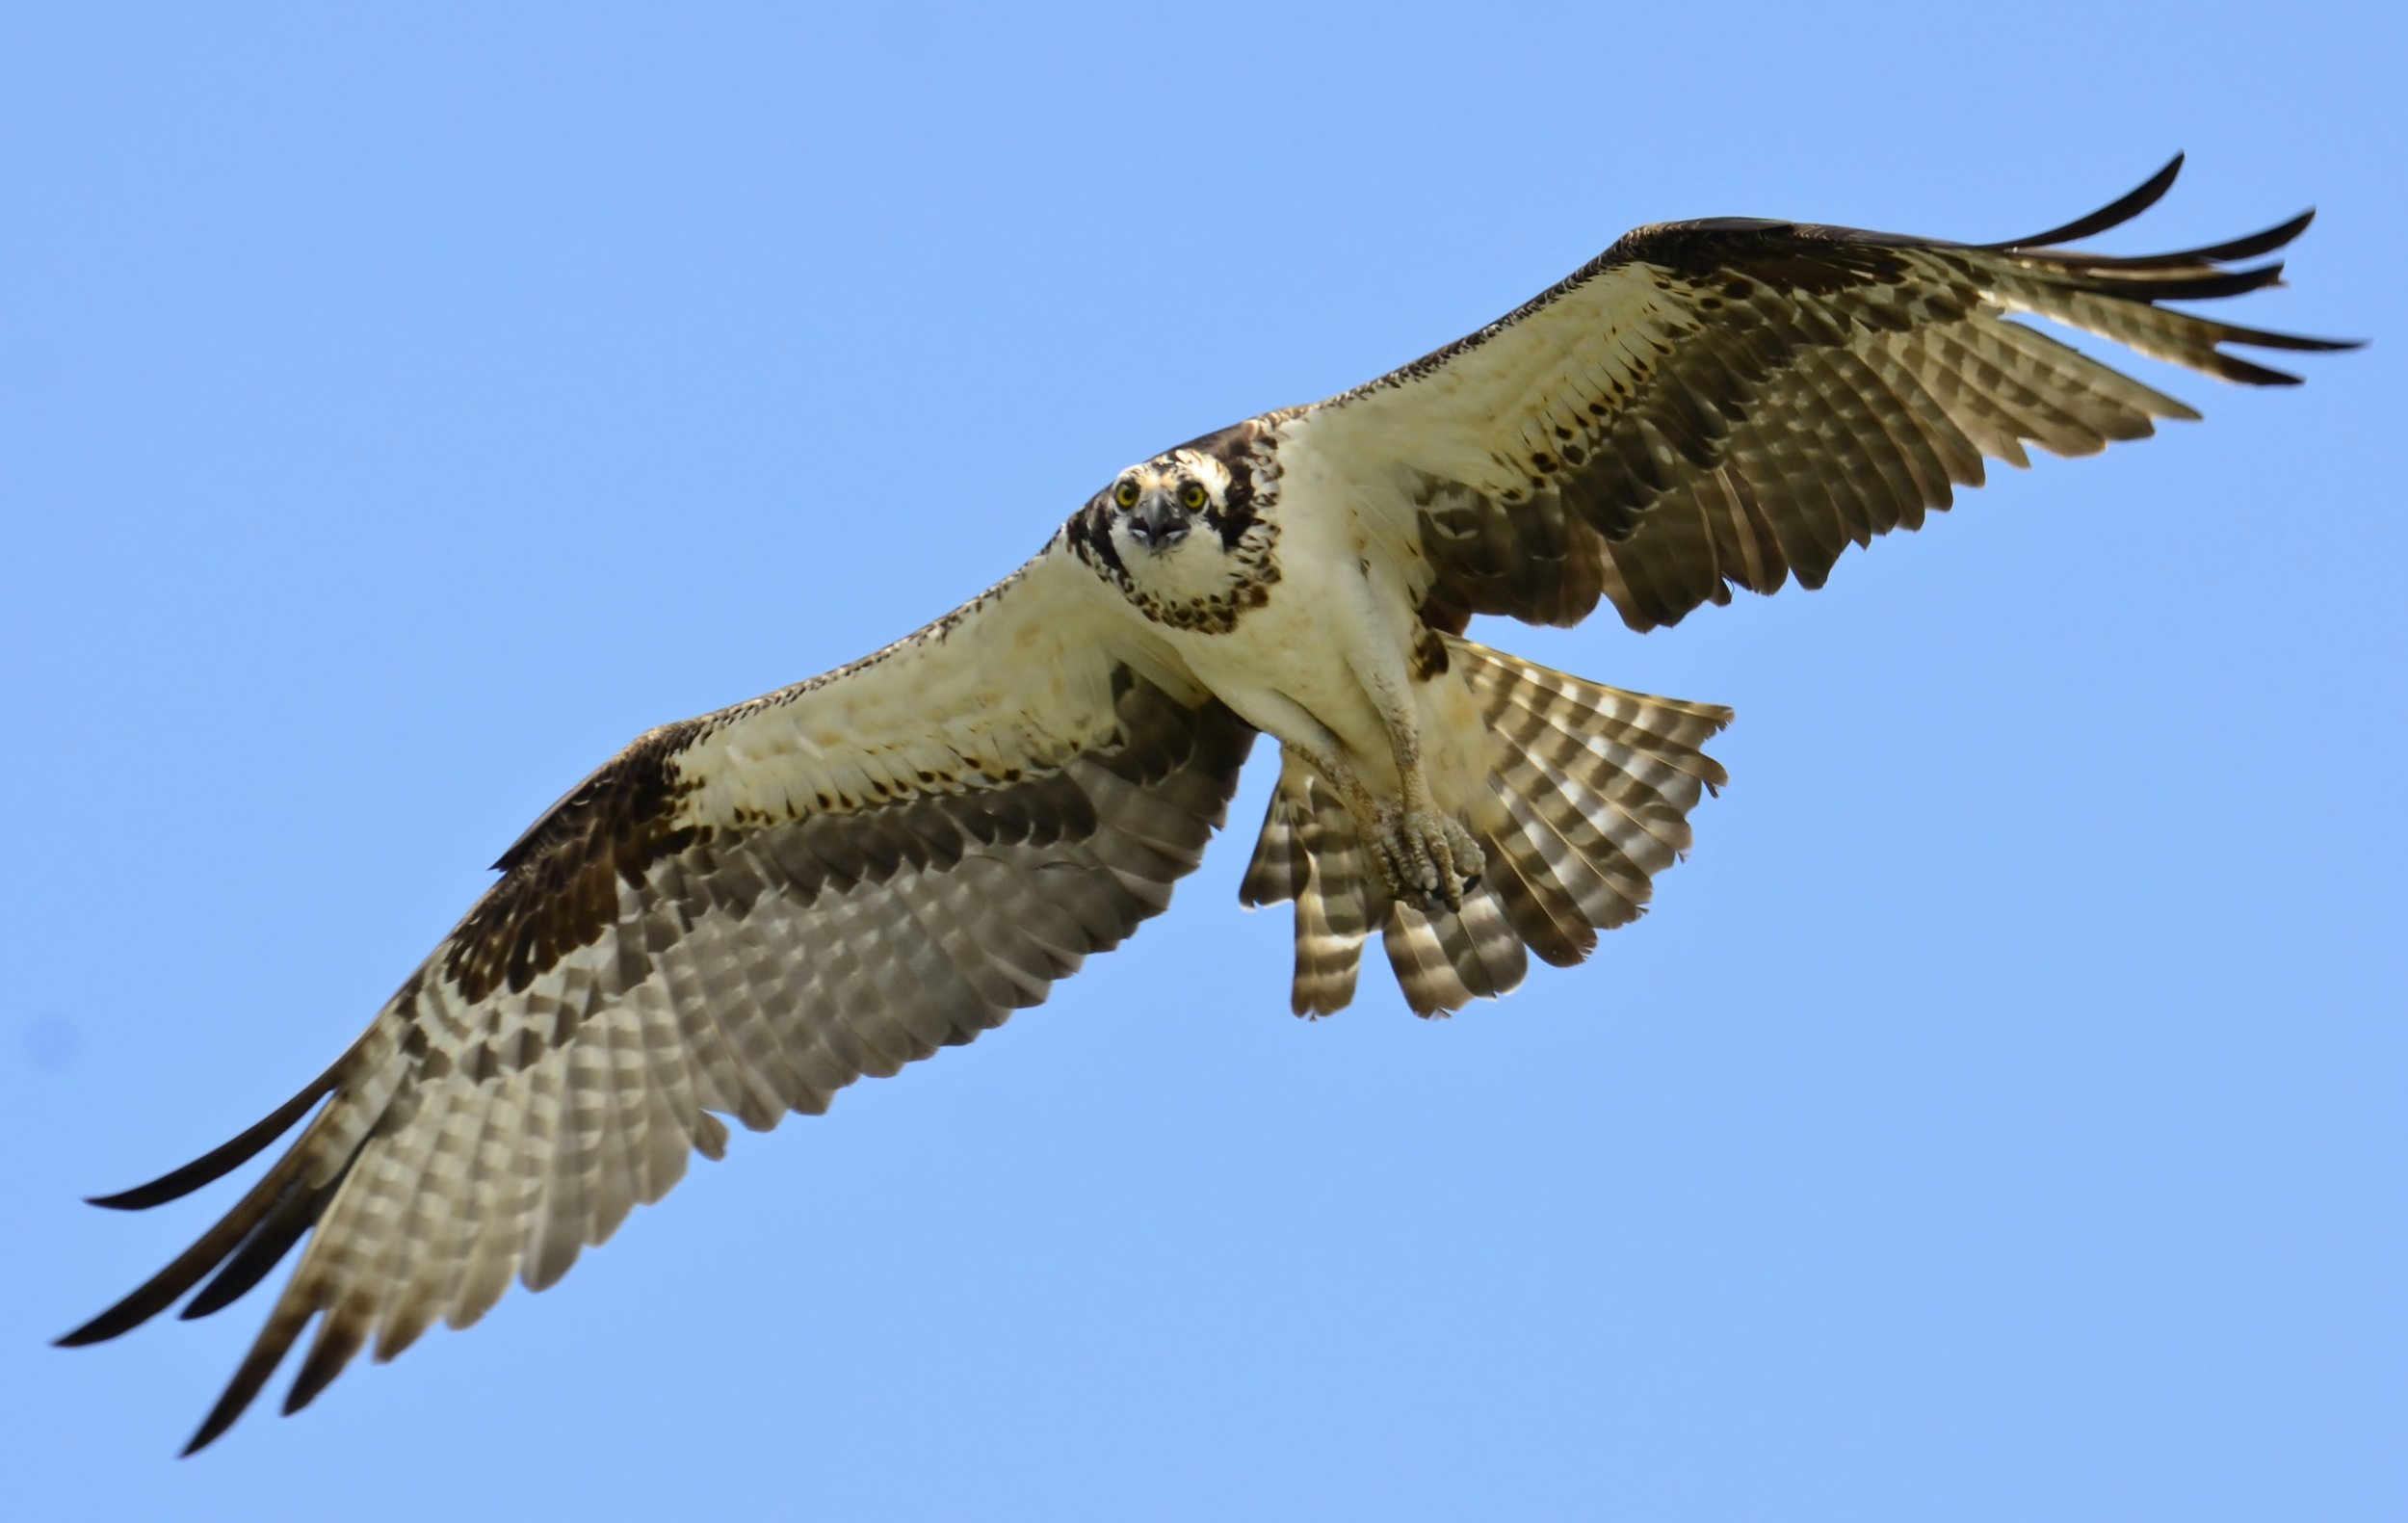 Osprey_in_flight_over_Lake_Wylie-Gareth Rasberry.jpg